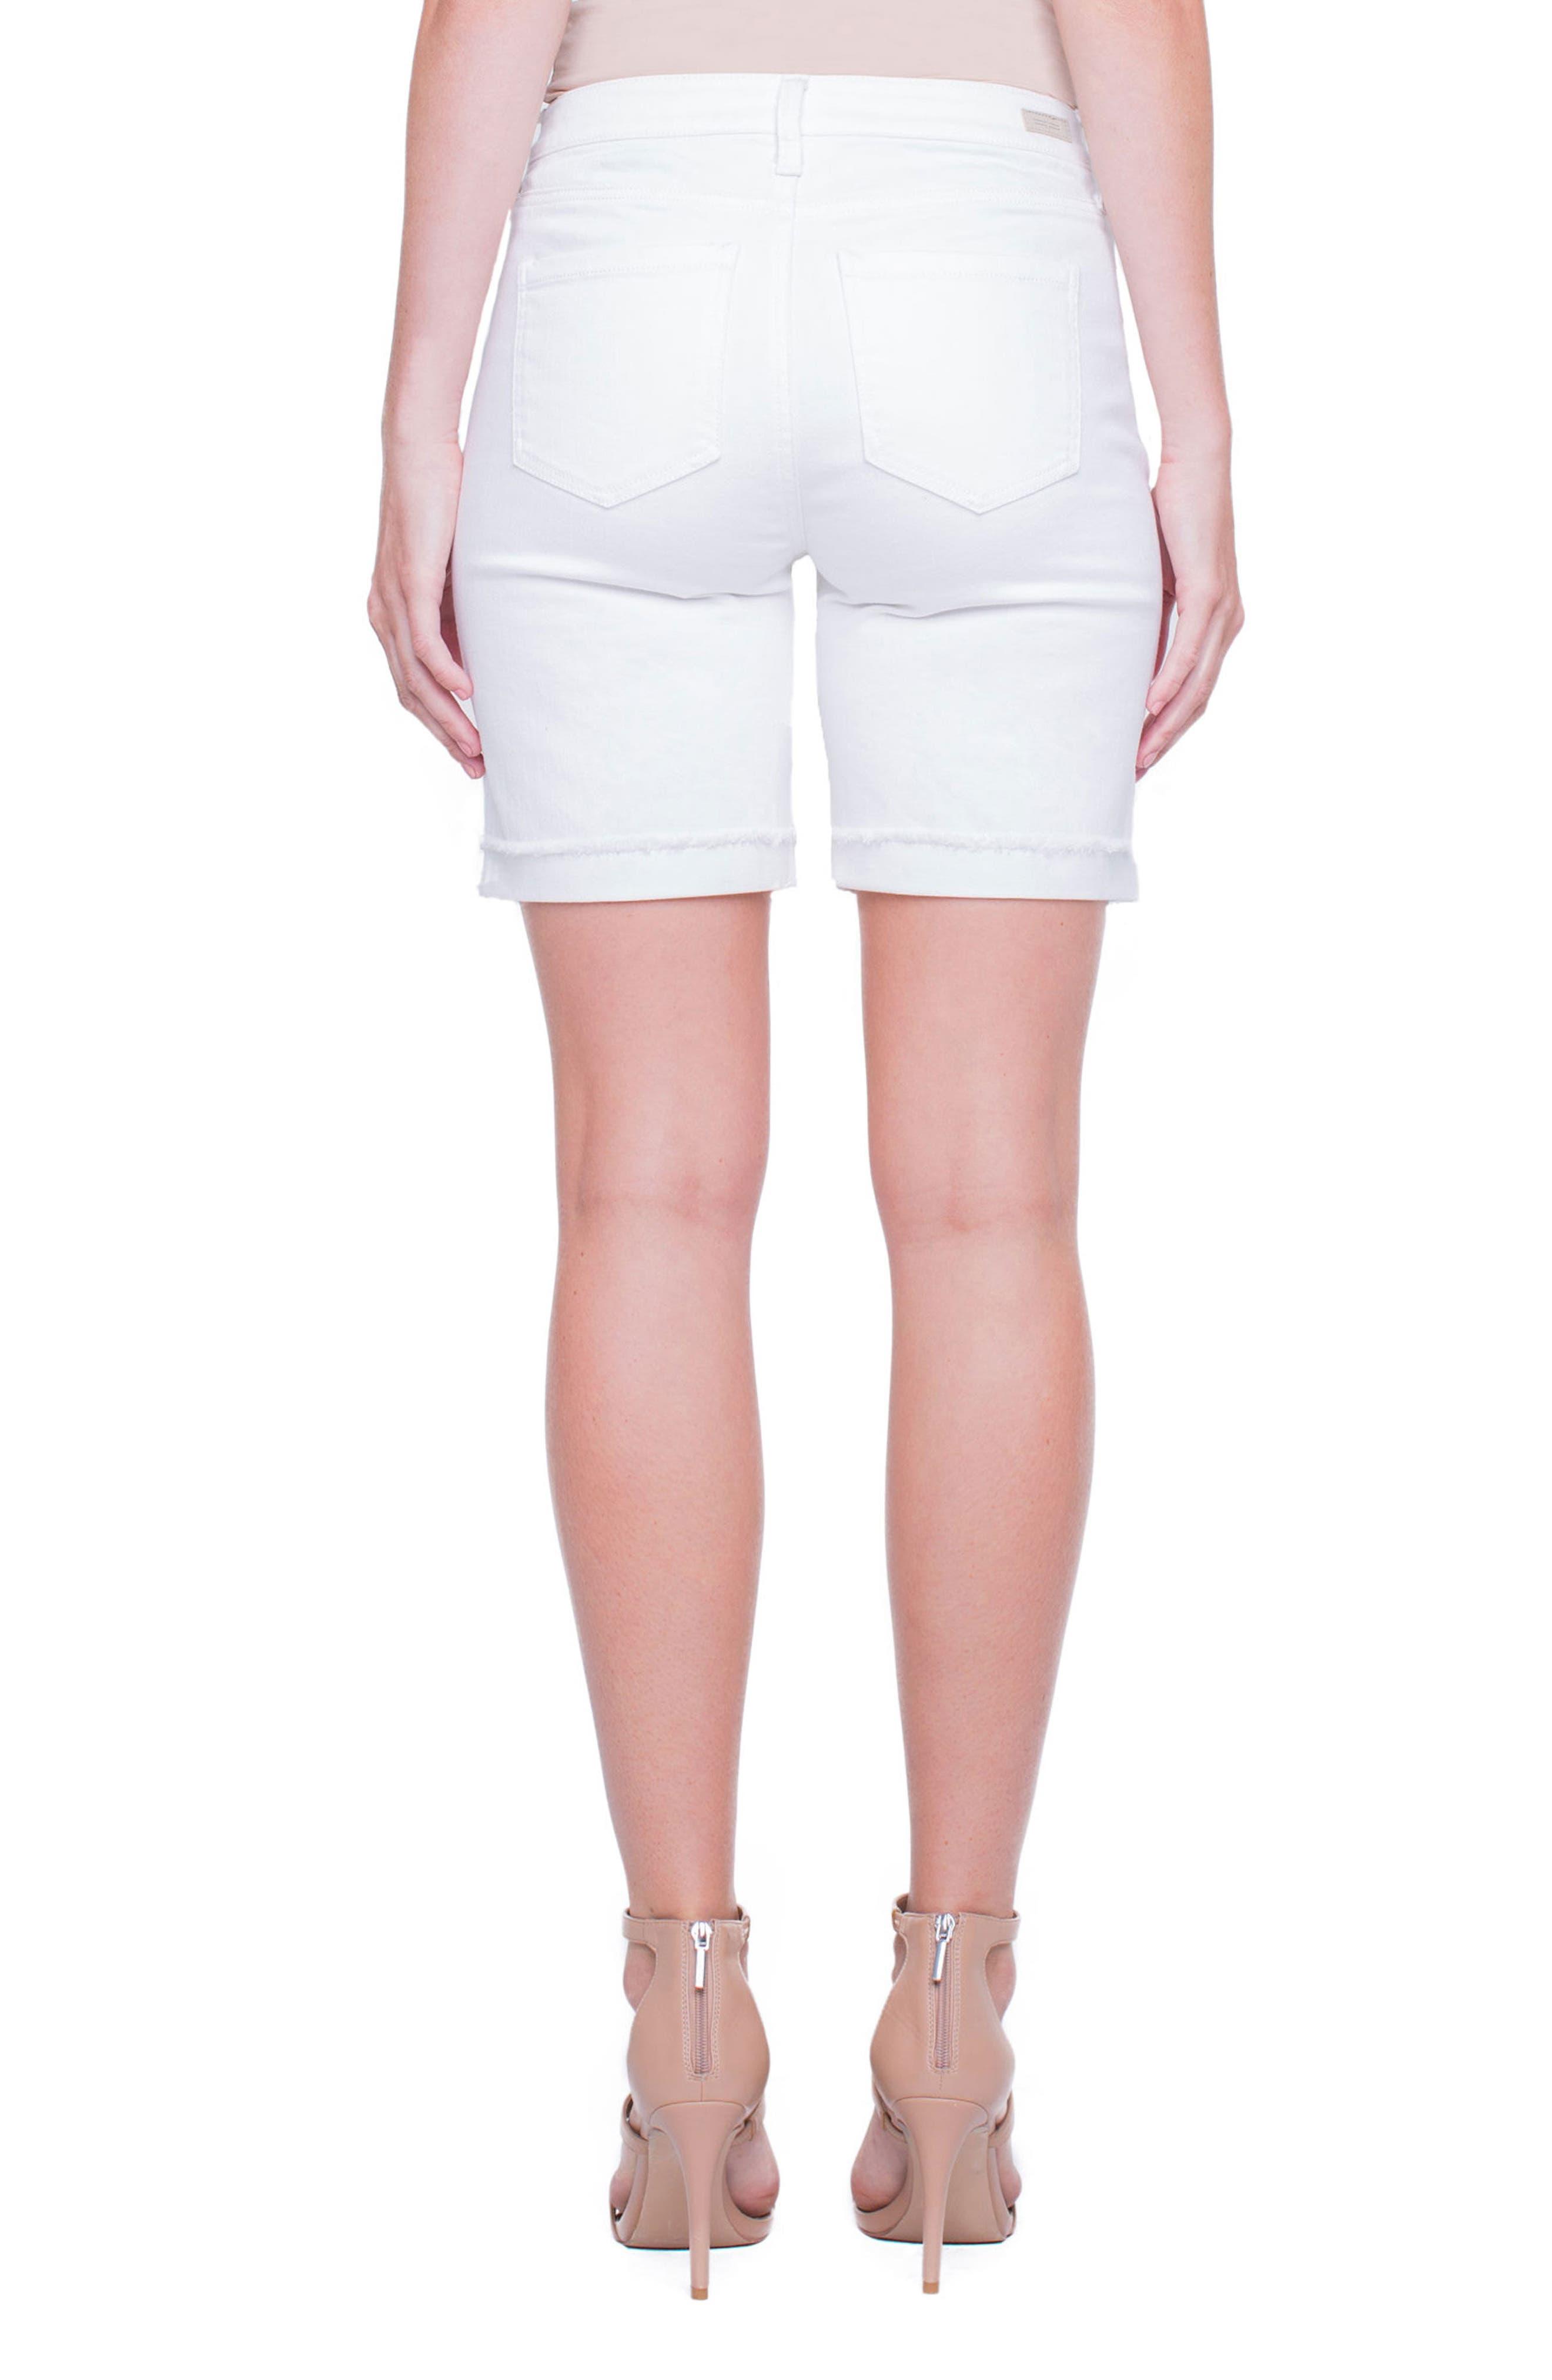 Casey White Denim Shorts,                             Alternate thumbnail 2, color,                             Bright White